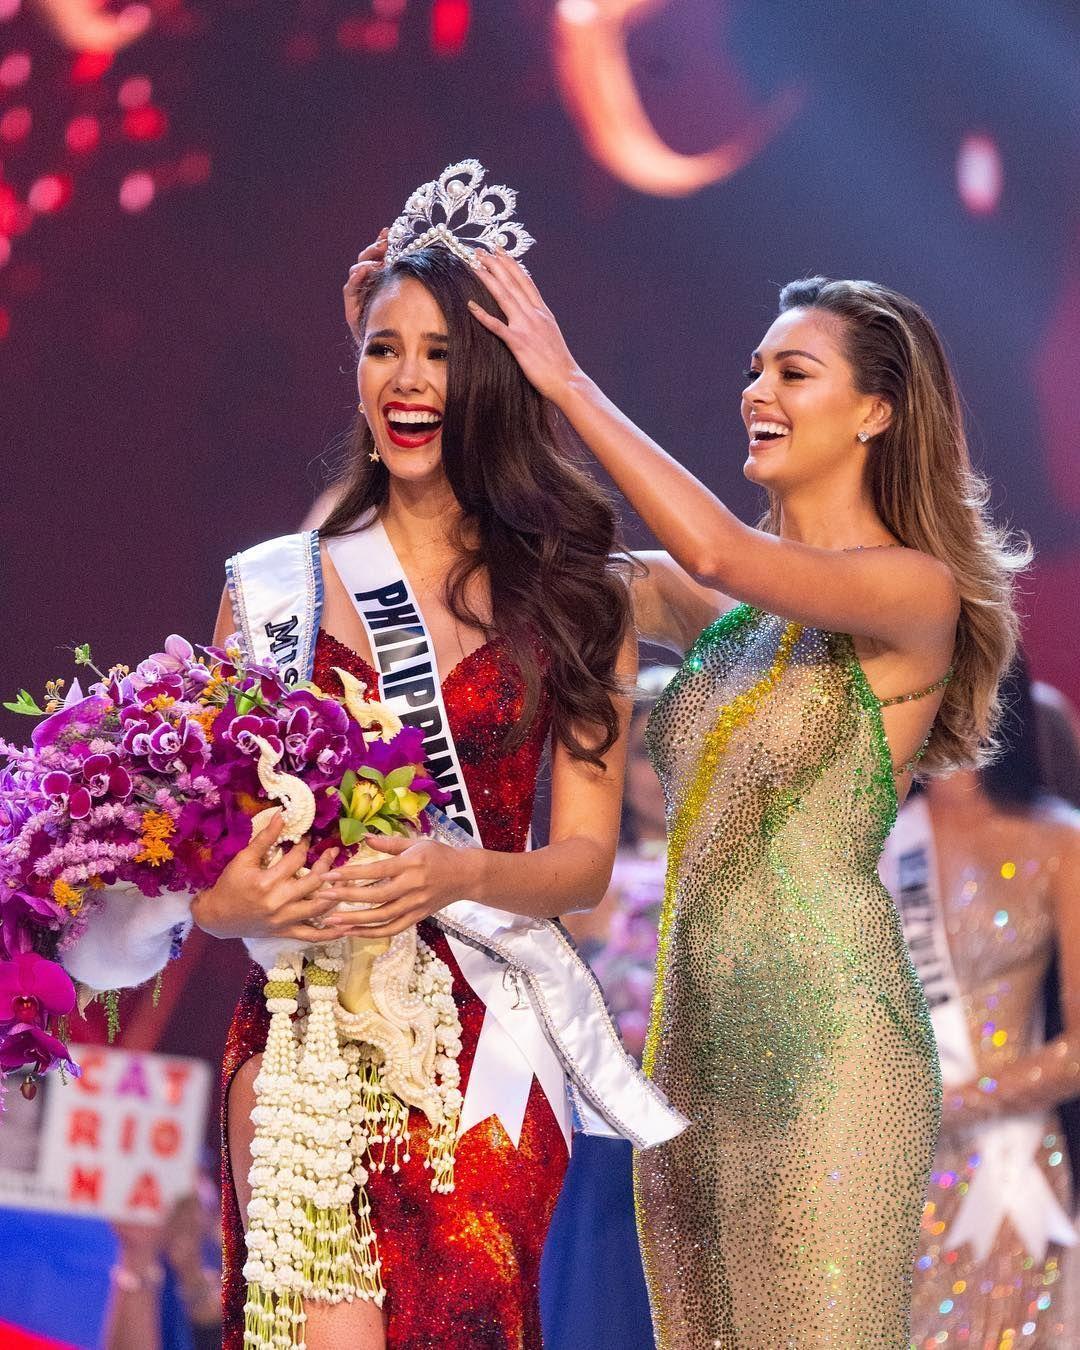 Gaun Melorot dan 4 Fakta yang Bikin Tercengang di Miss Universe 2018